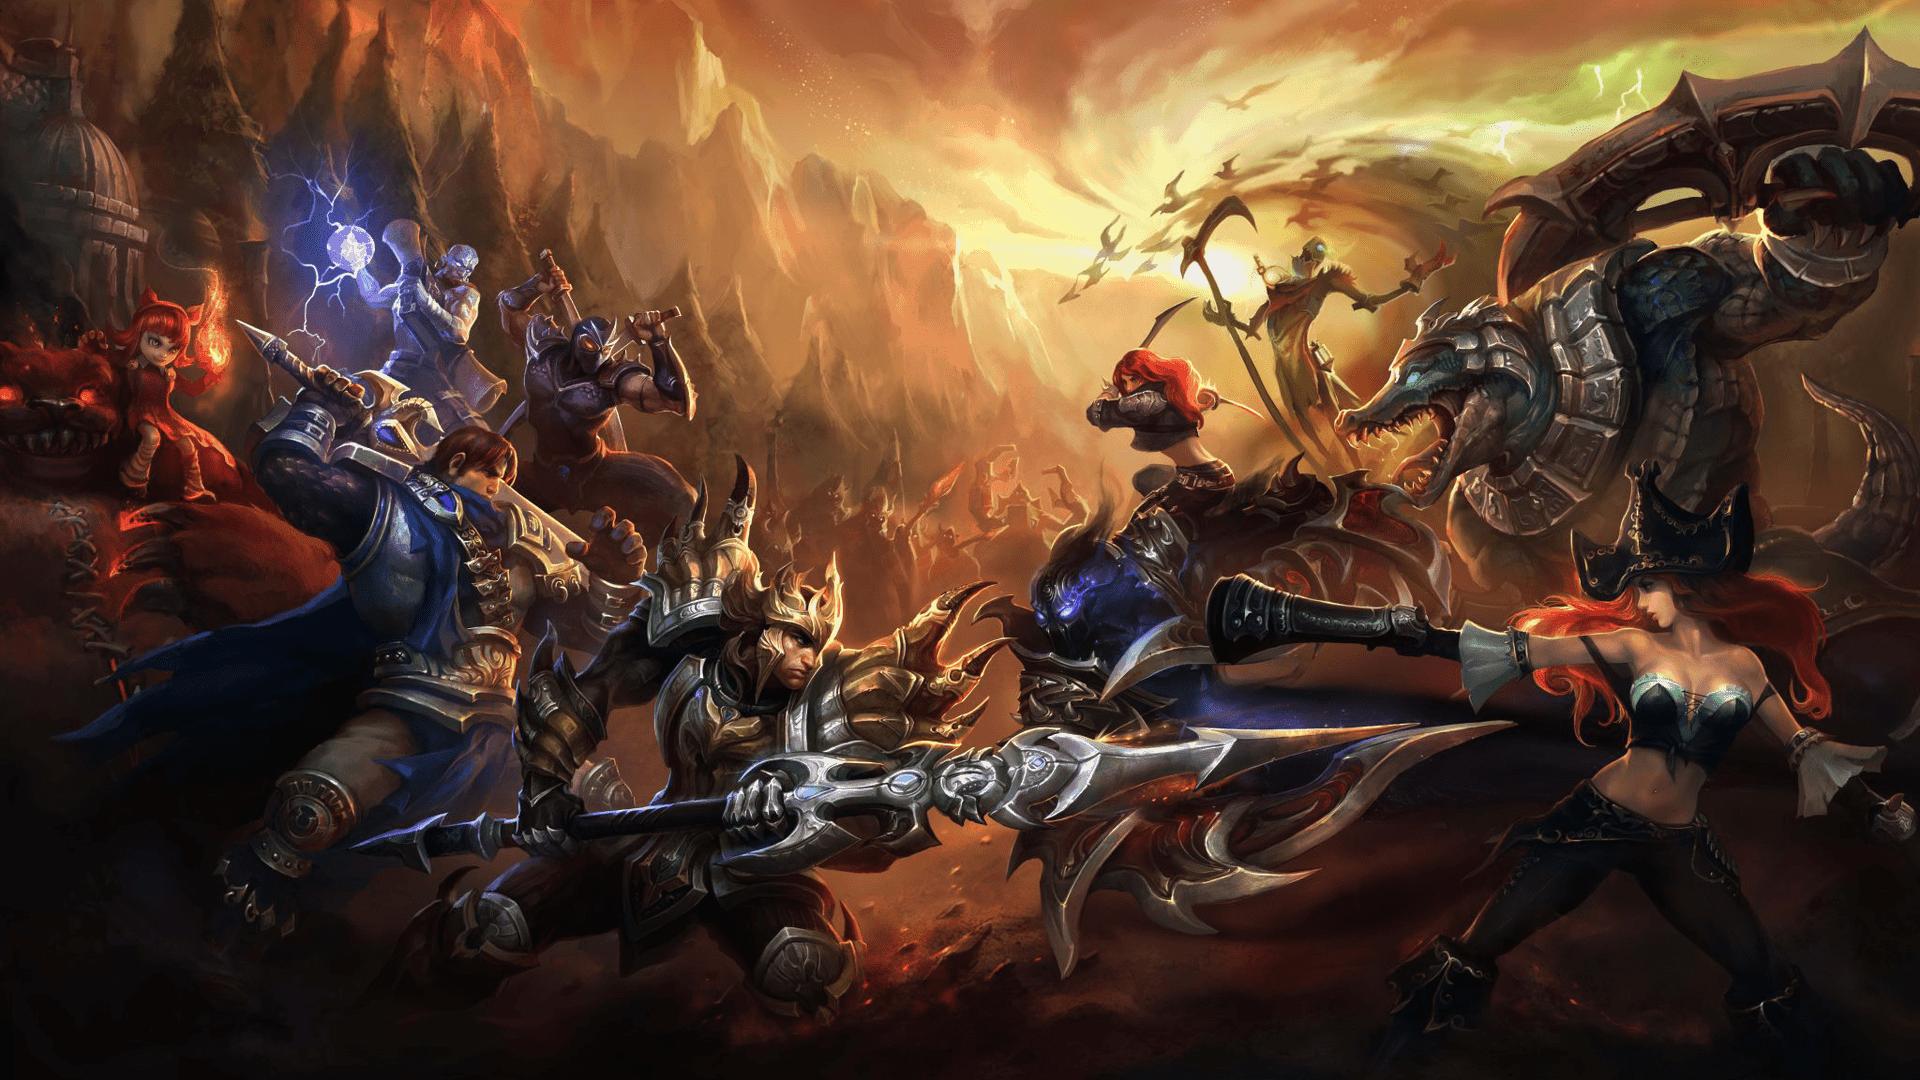 League of Legends Wallpaper 001